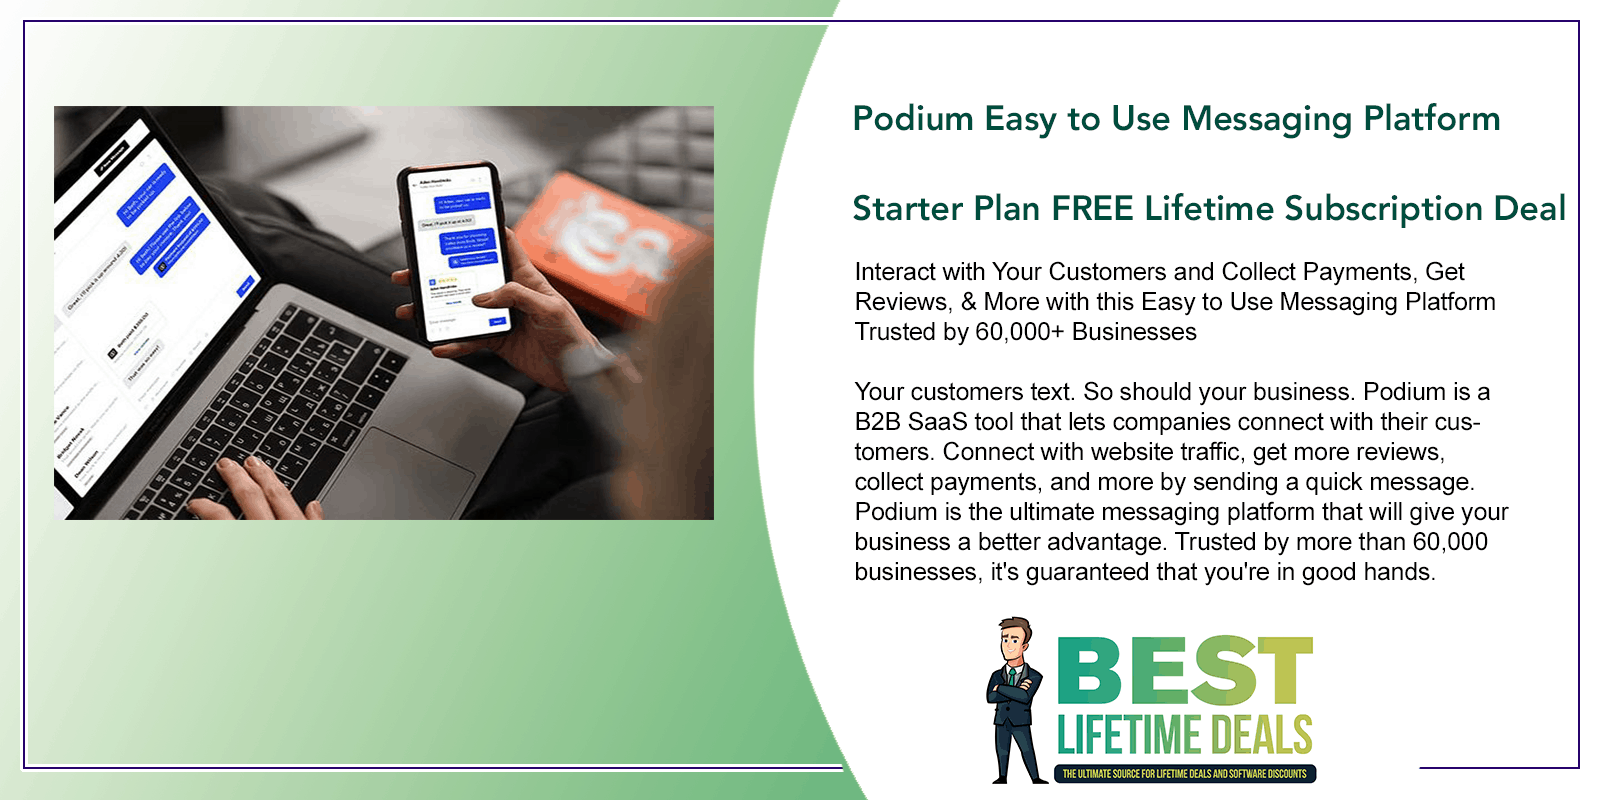 Podium Easy to Use Messaging Platform Starter Plan Featured Image